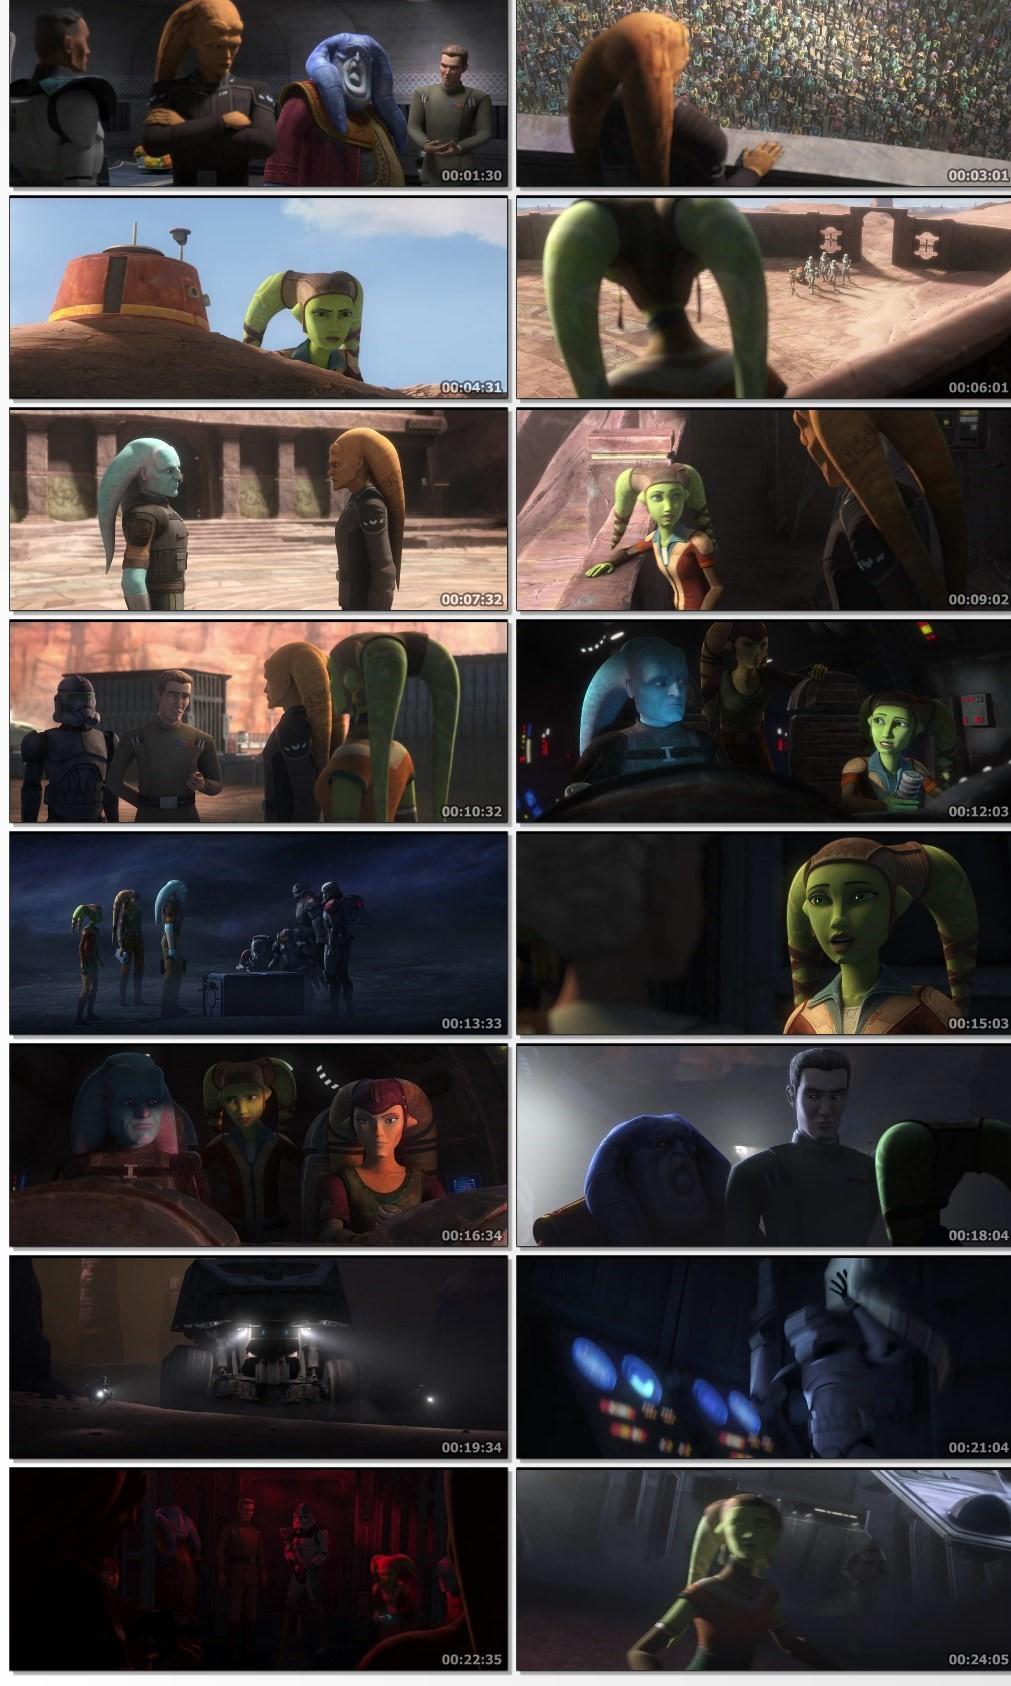 Star-Wars-The-Bad-Batch-2021-S01-E11-English-720p-DSNP-HDRip-170-MB-mkv-thumbsb2c3f5799b60b37d